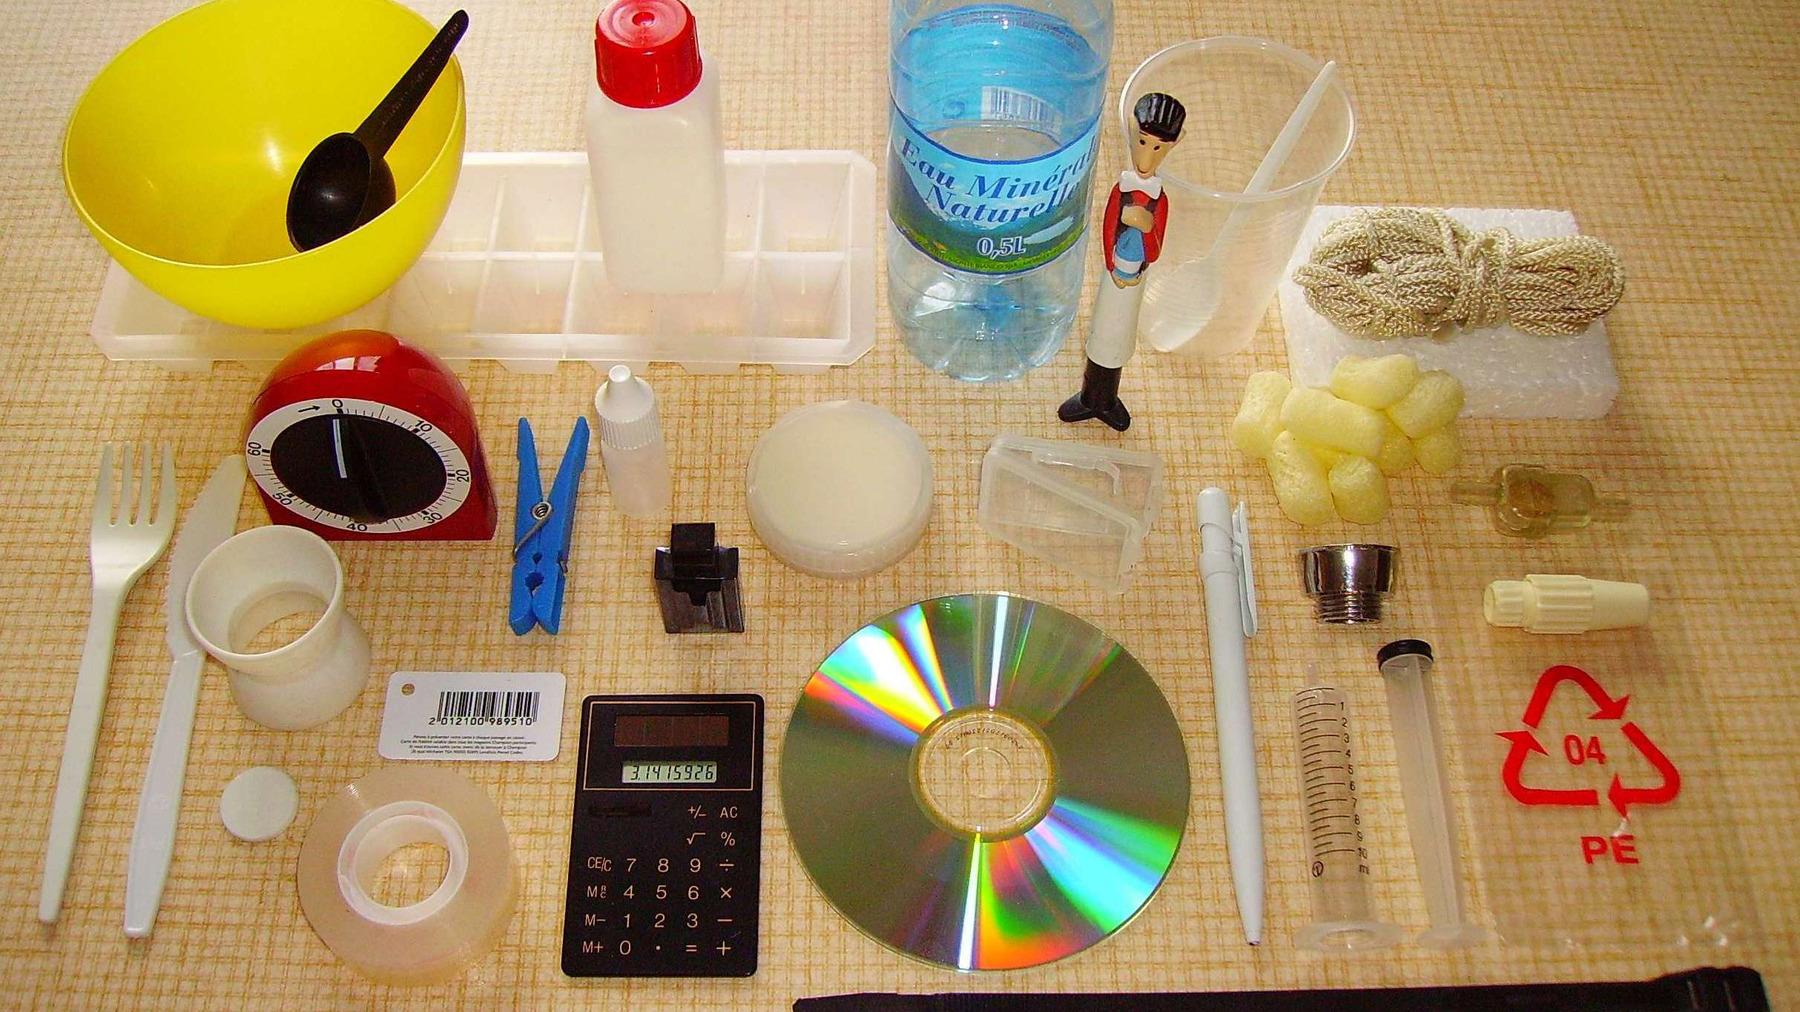 plastic objects via Wikimedia Commons